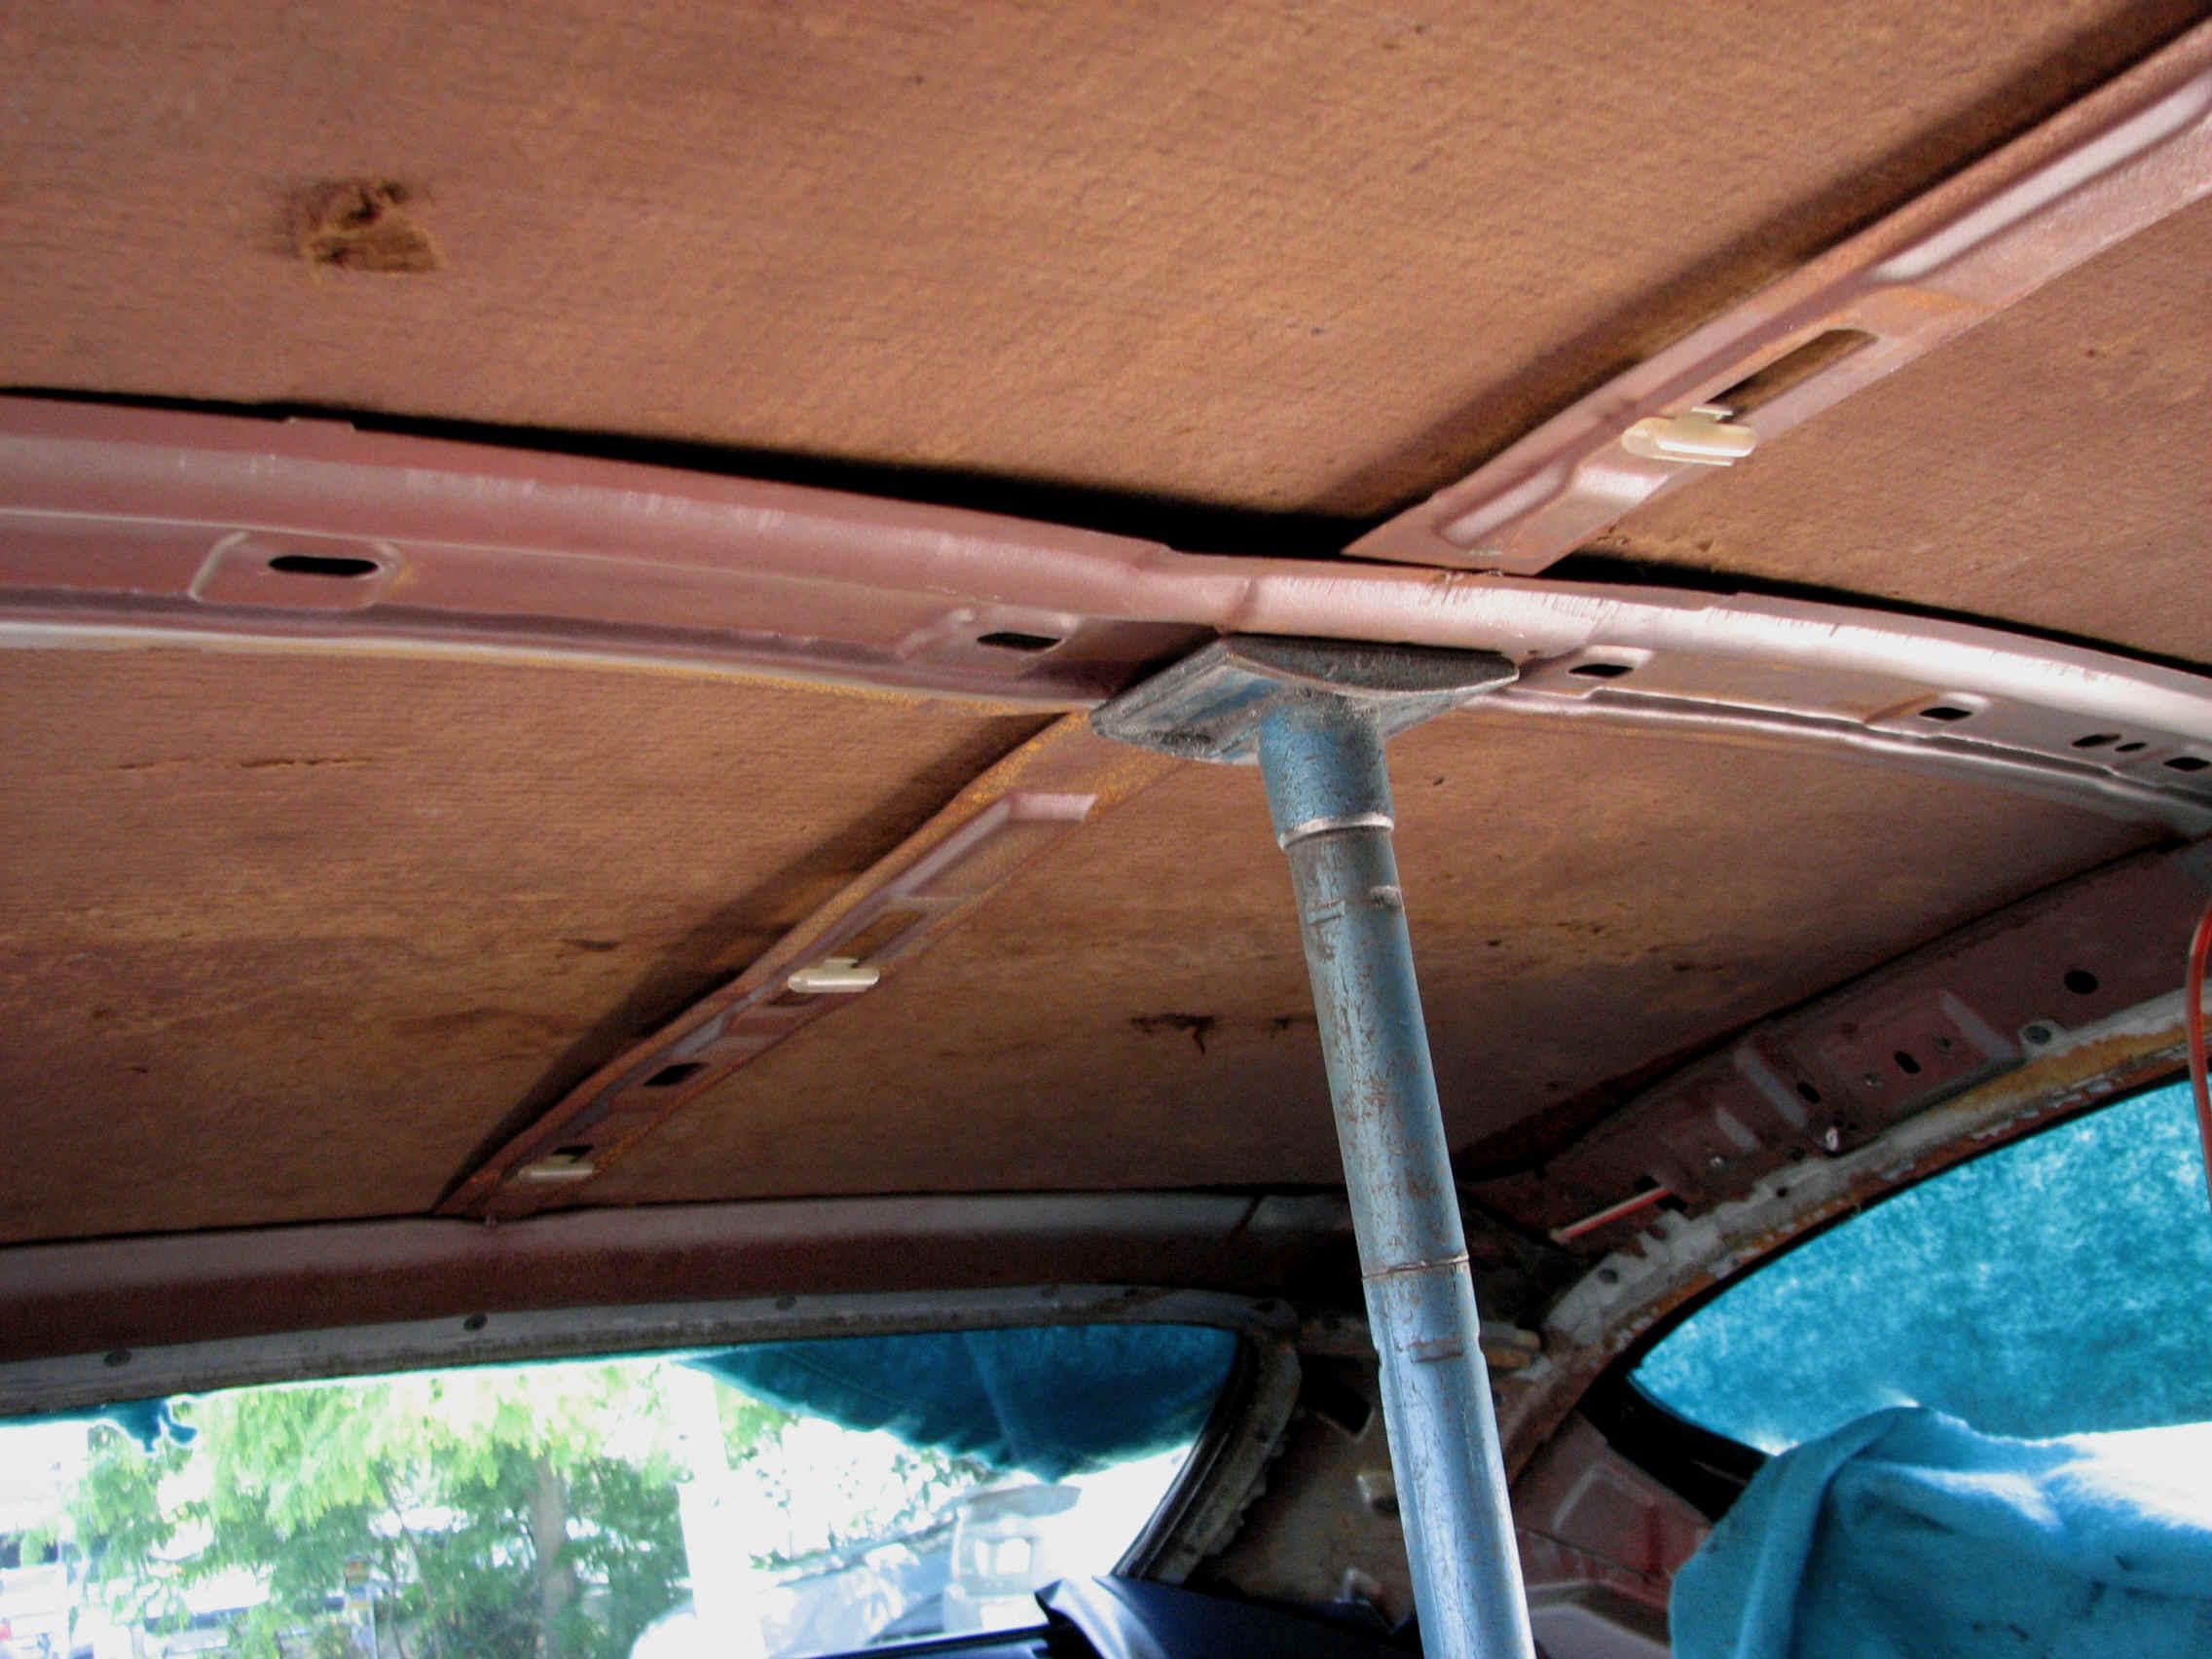 Car interior roof repair - Chevelle Ss396 Delee Headliner 0 Jpg 3466937 Bytes